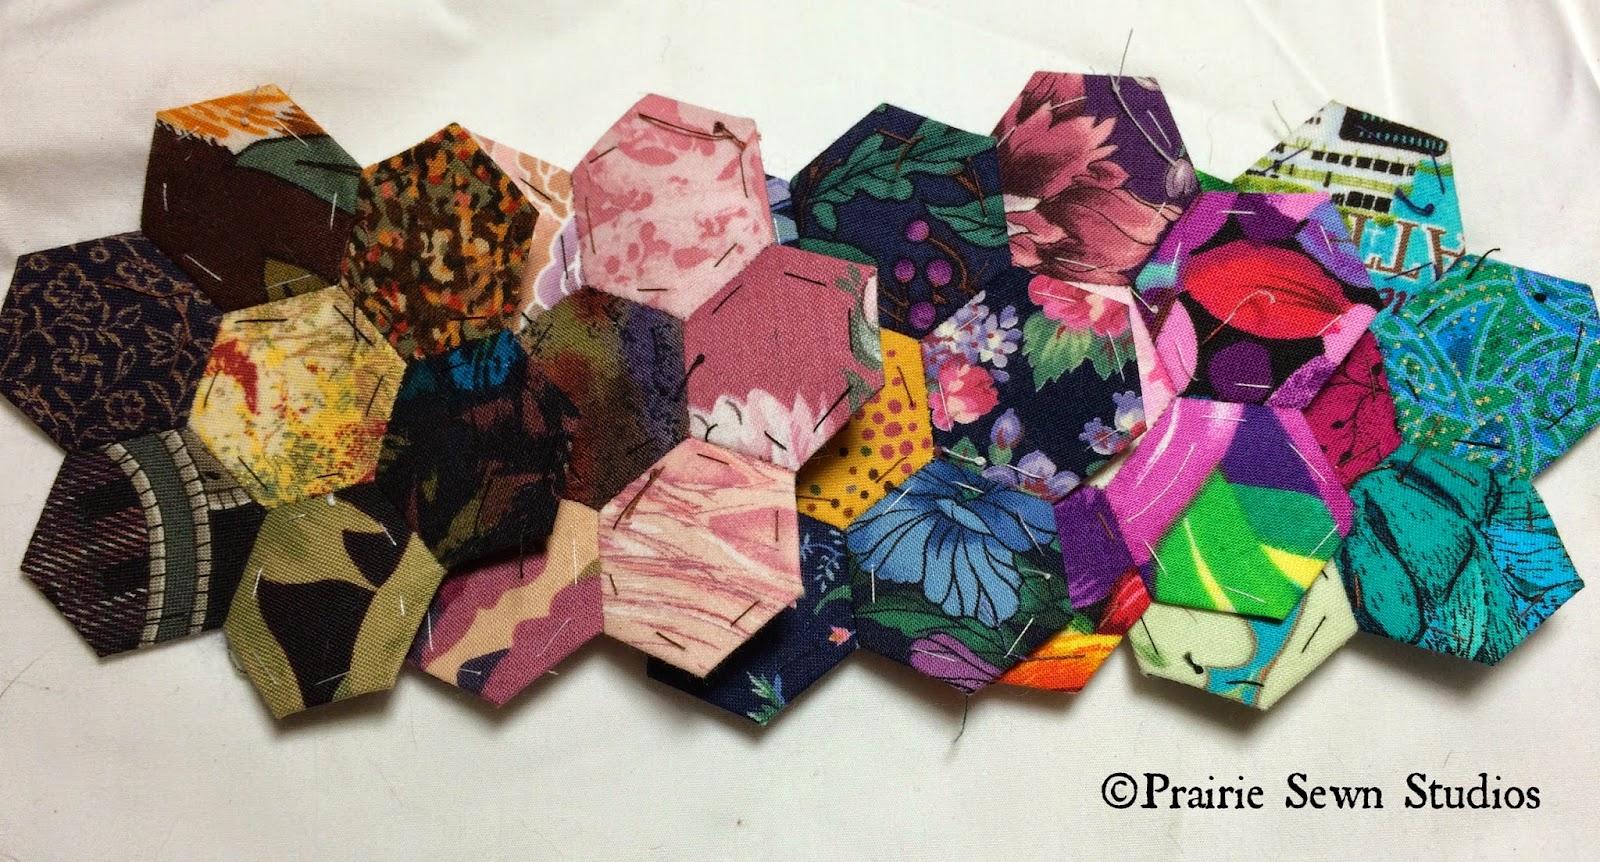 Prairie Sewn Studios WIP Grandmother's Flower Garden